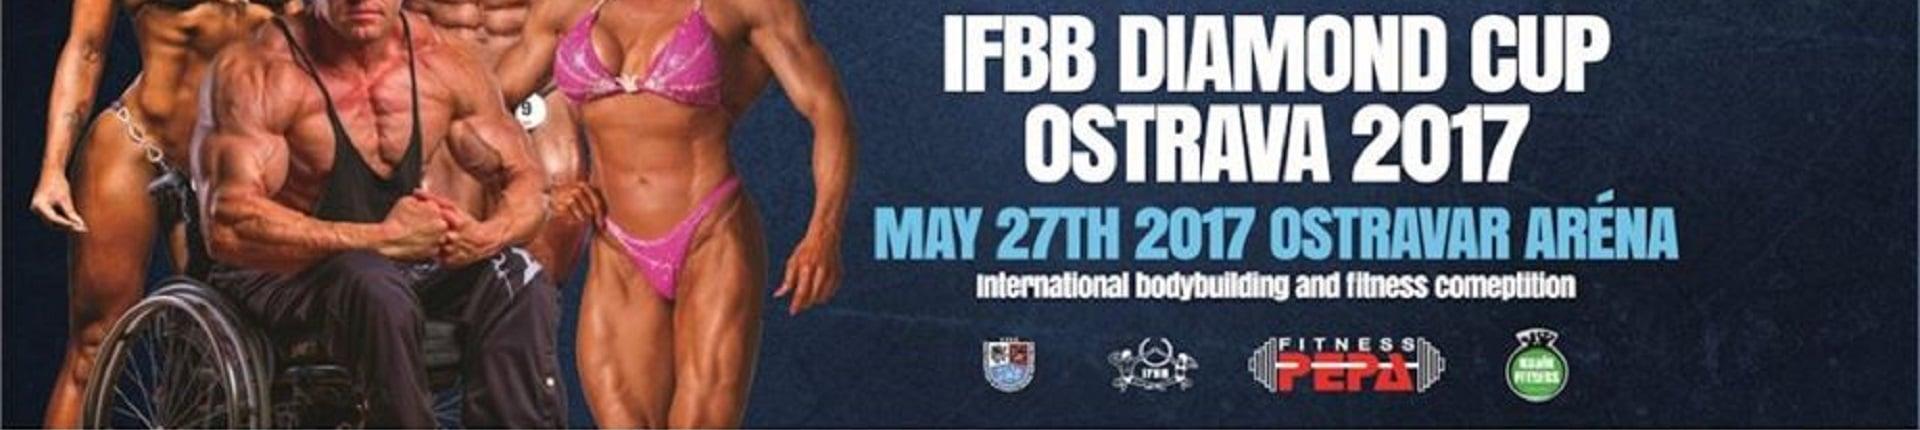 27.05.2017 IFBB DIAMOND CUP – OSTRAWA